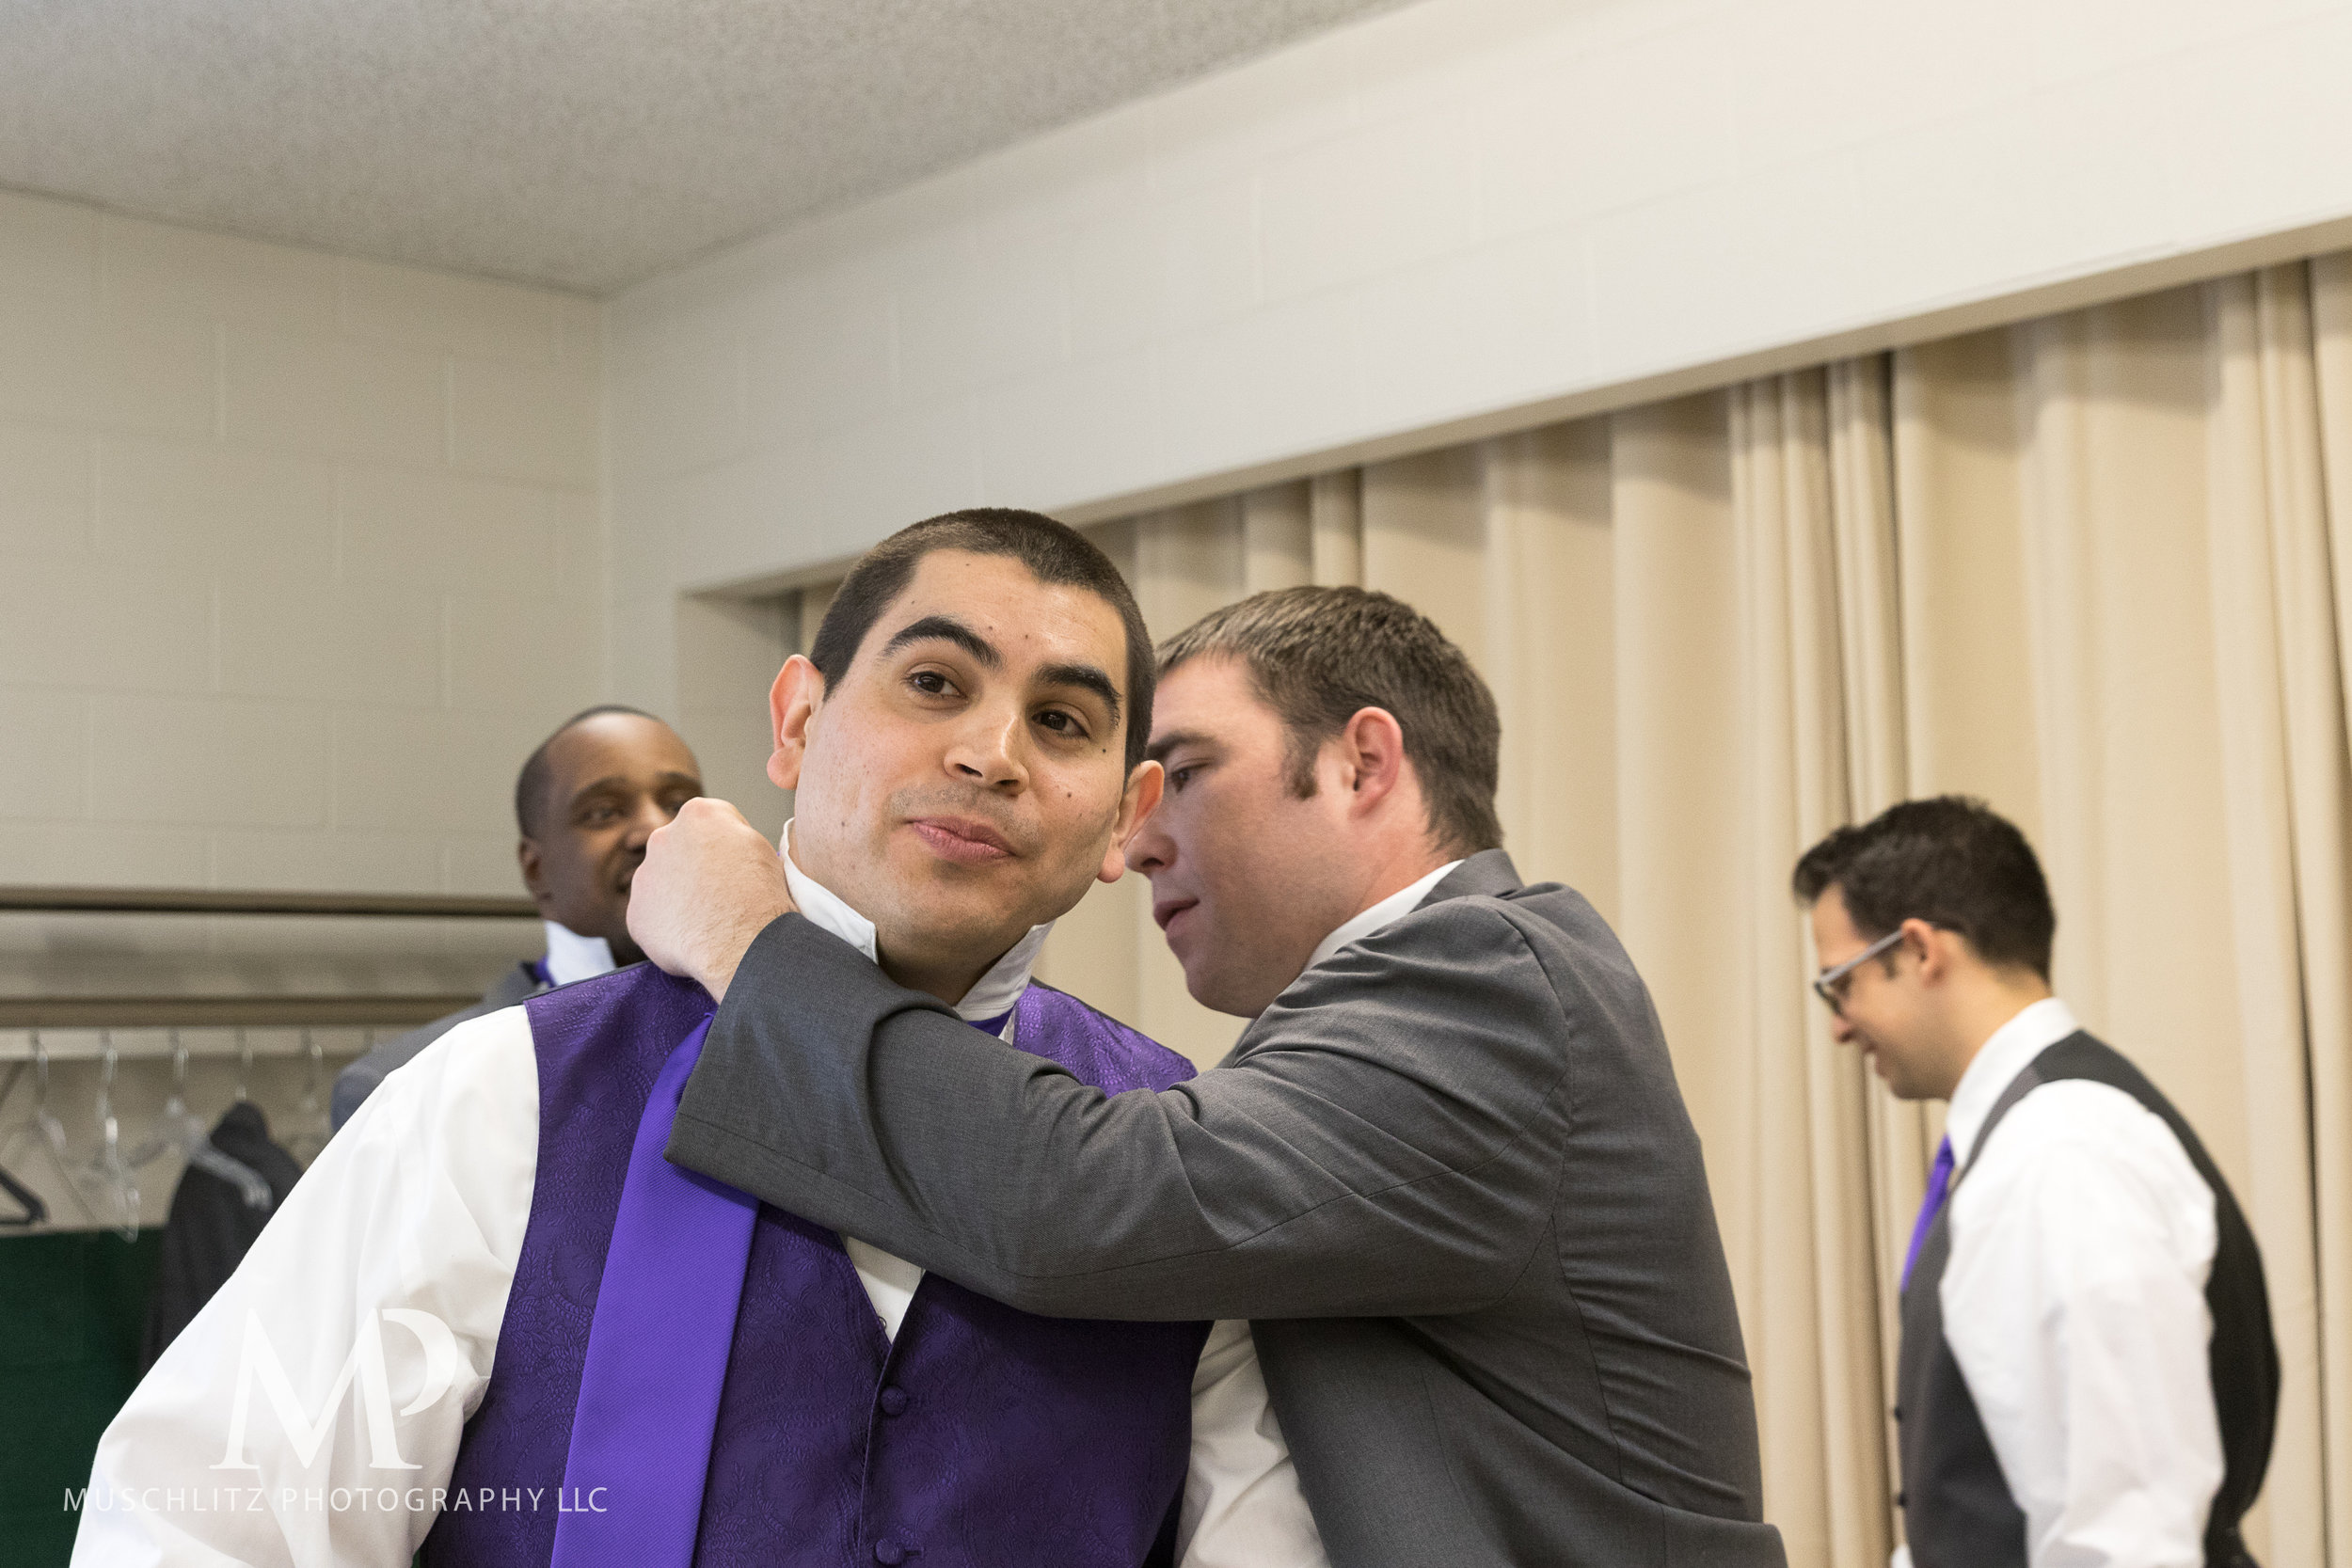 dublin-community-church-wedding-columbus-ohio-muschlitz-photography-009.JPG